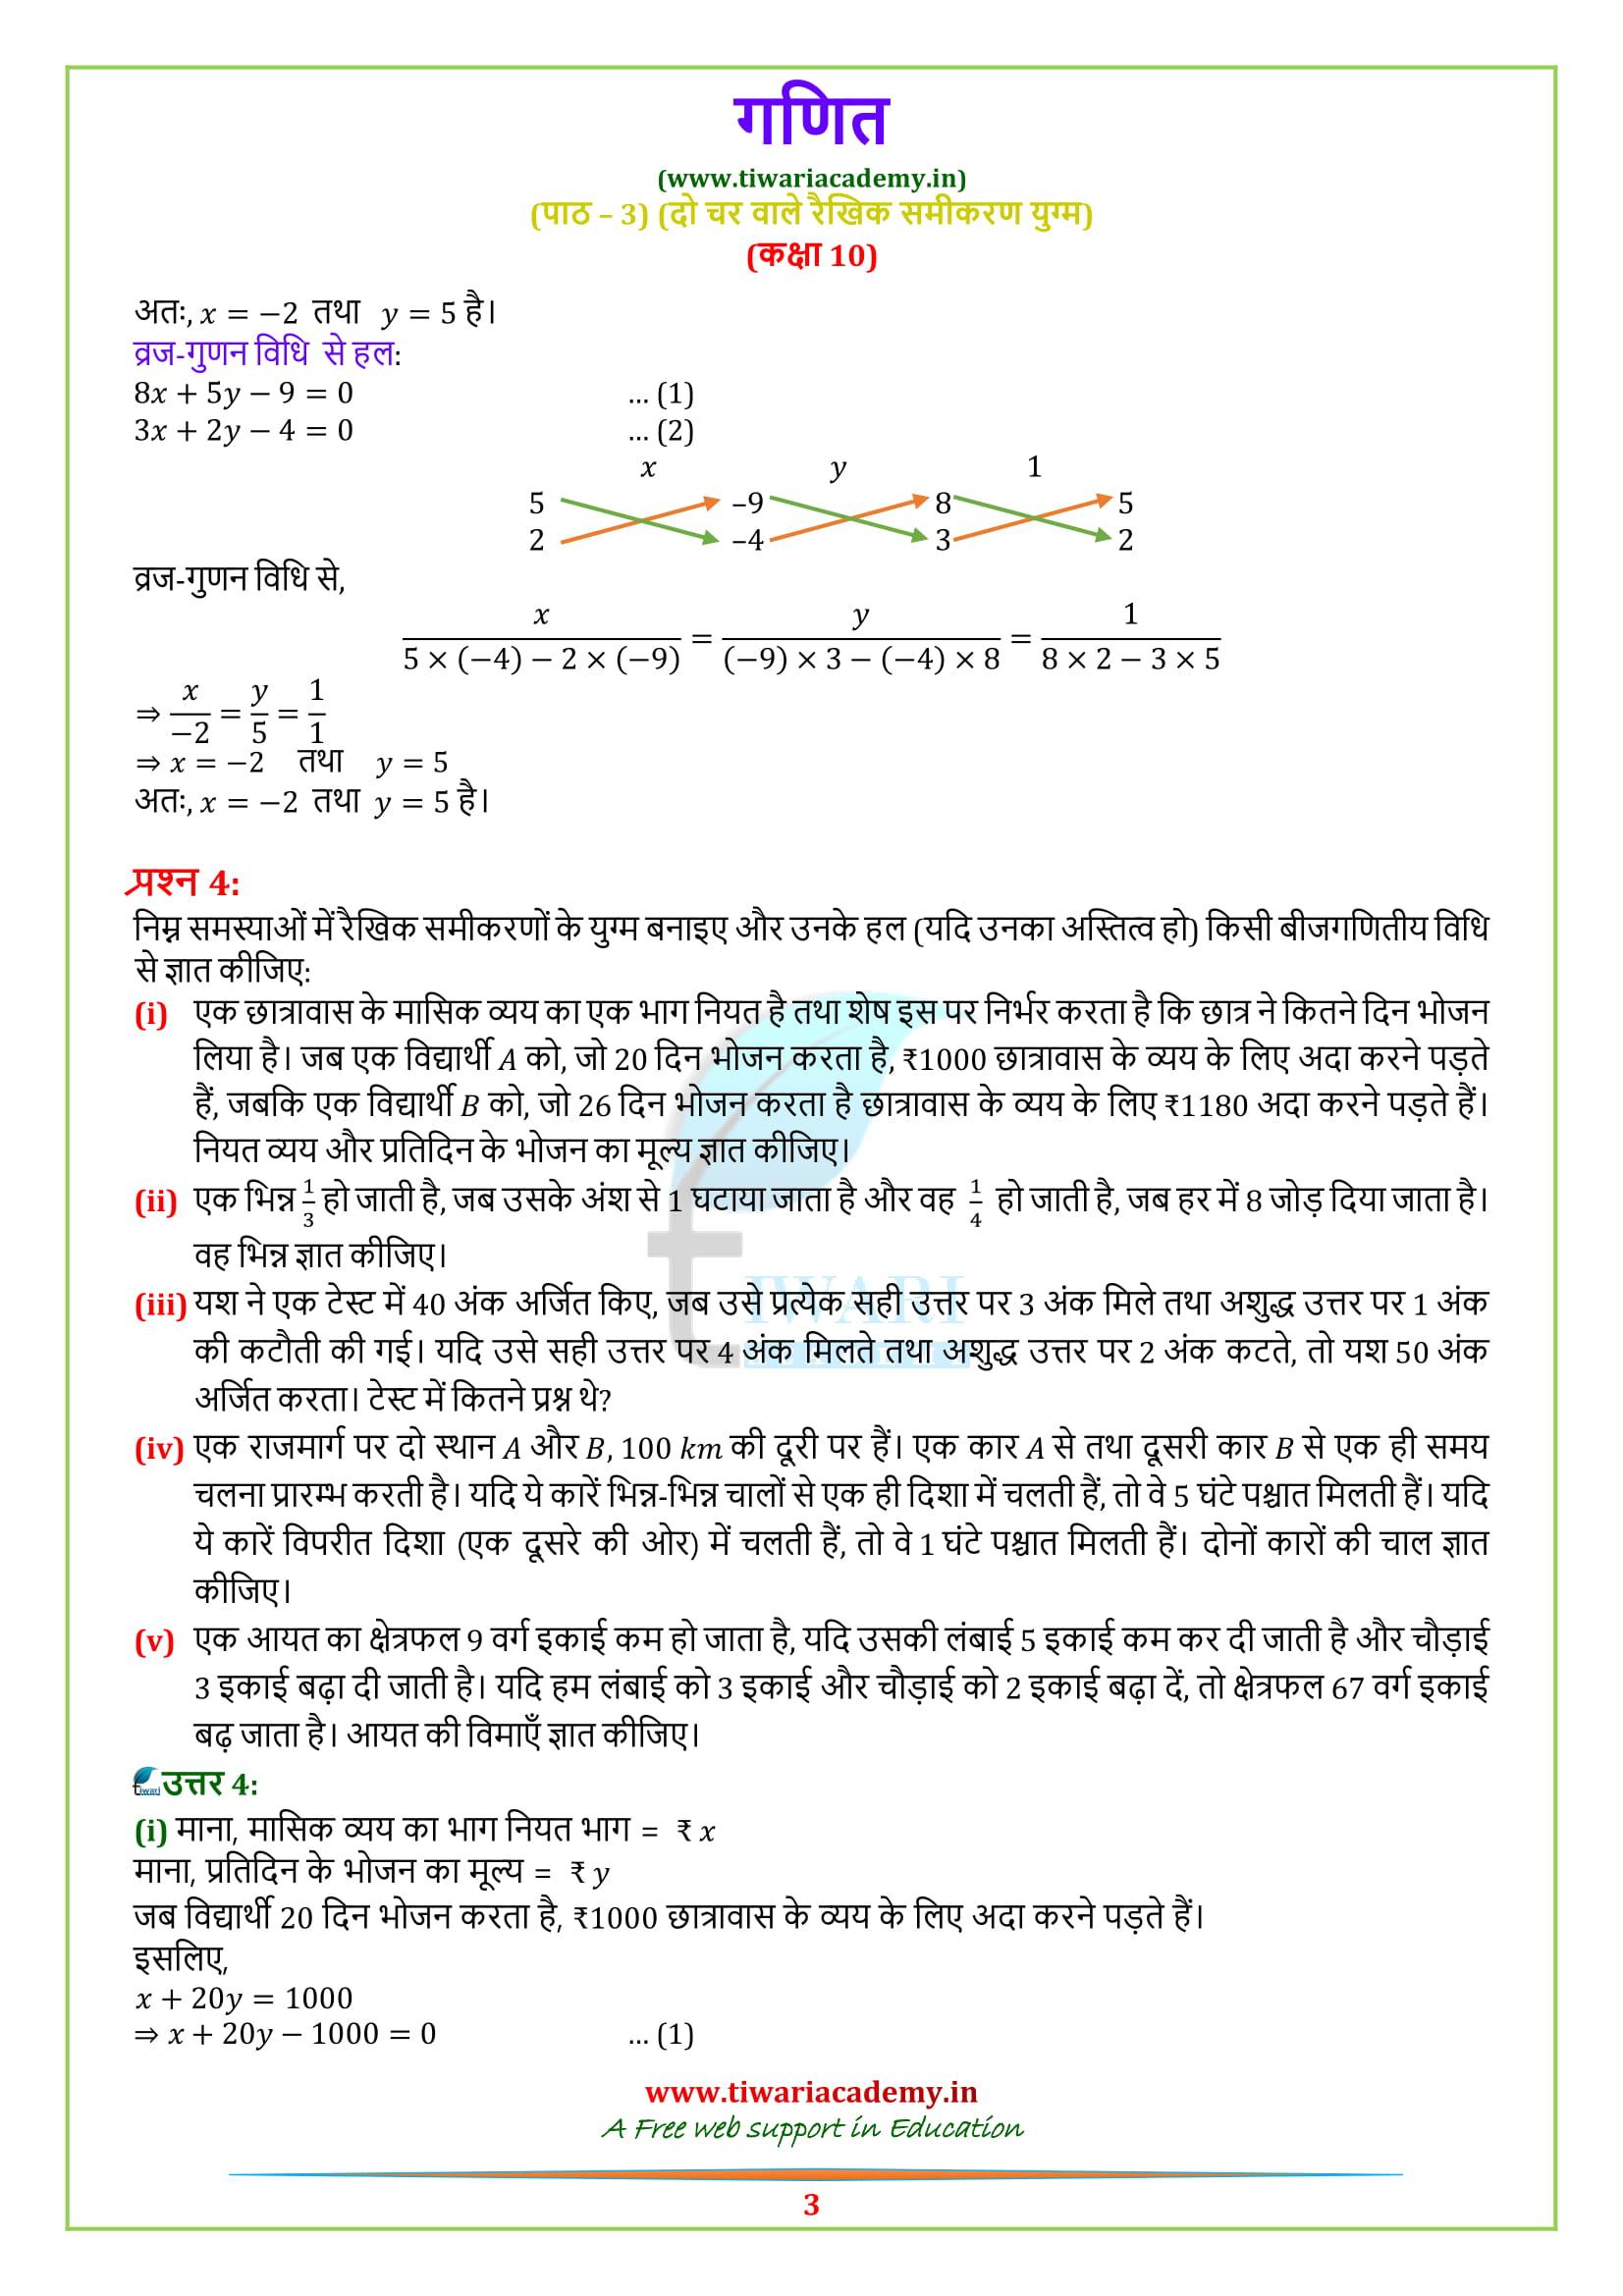 Class 10 Maths Exercise 3.5 ke prashn uttar